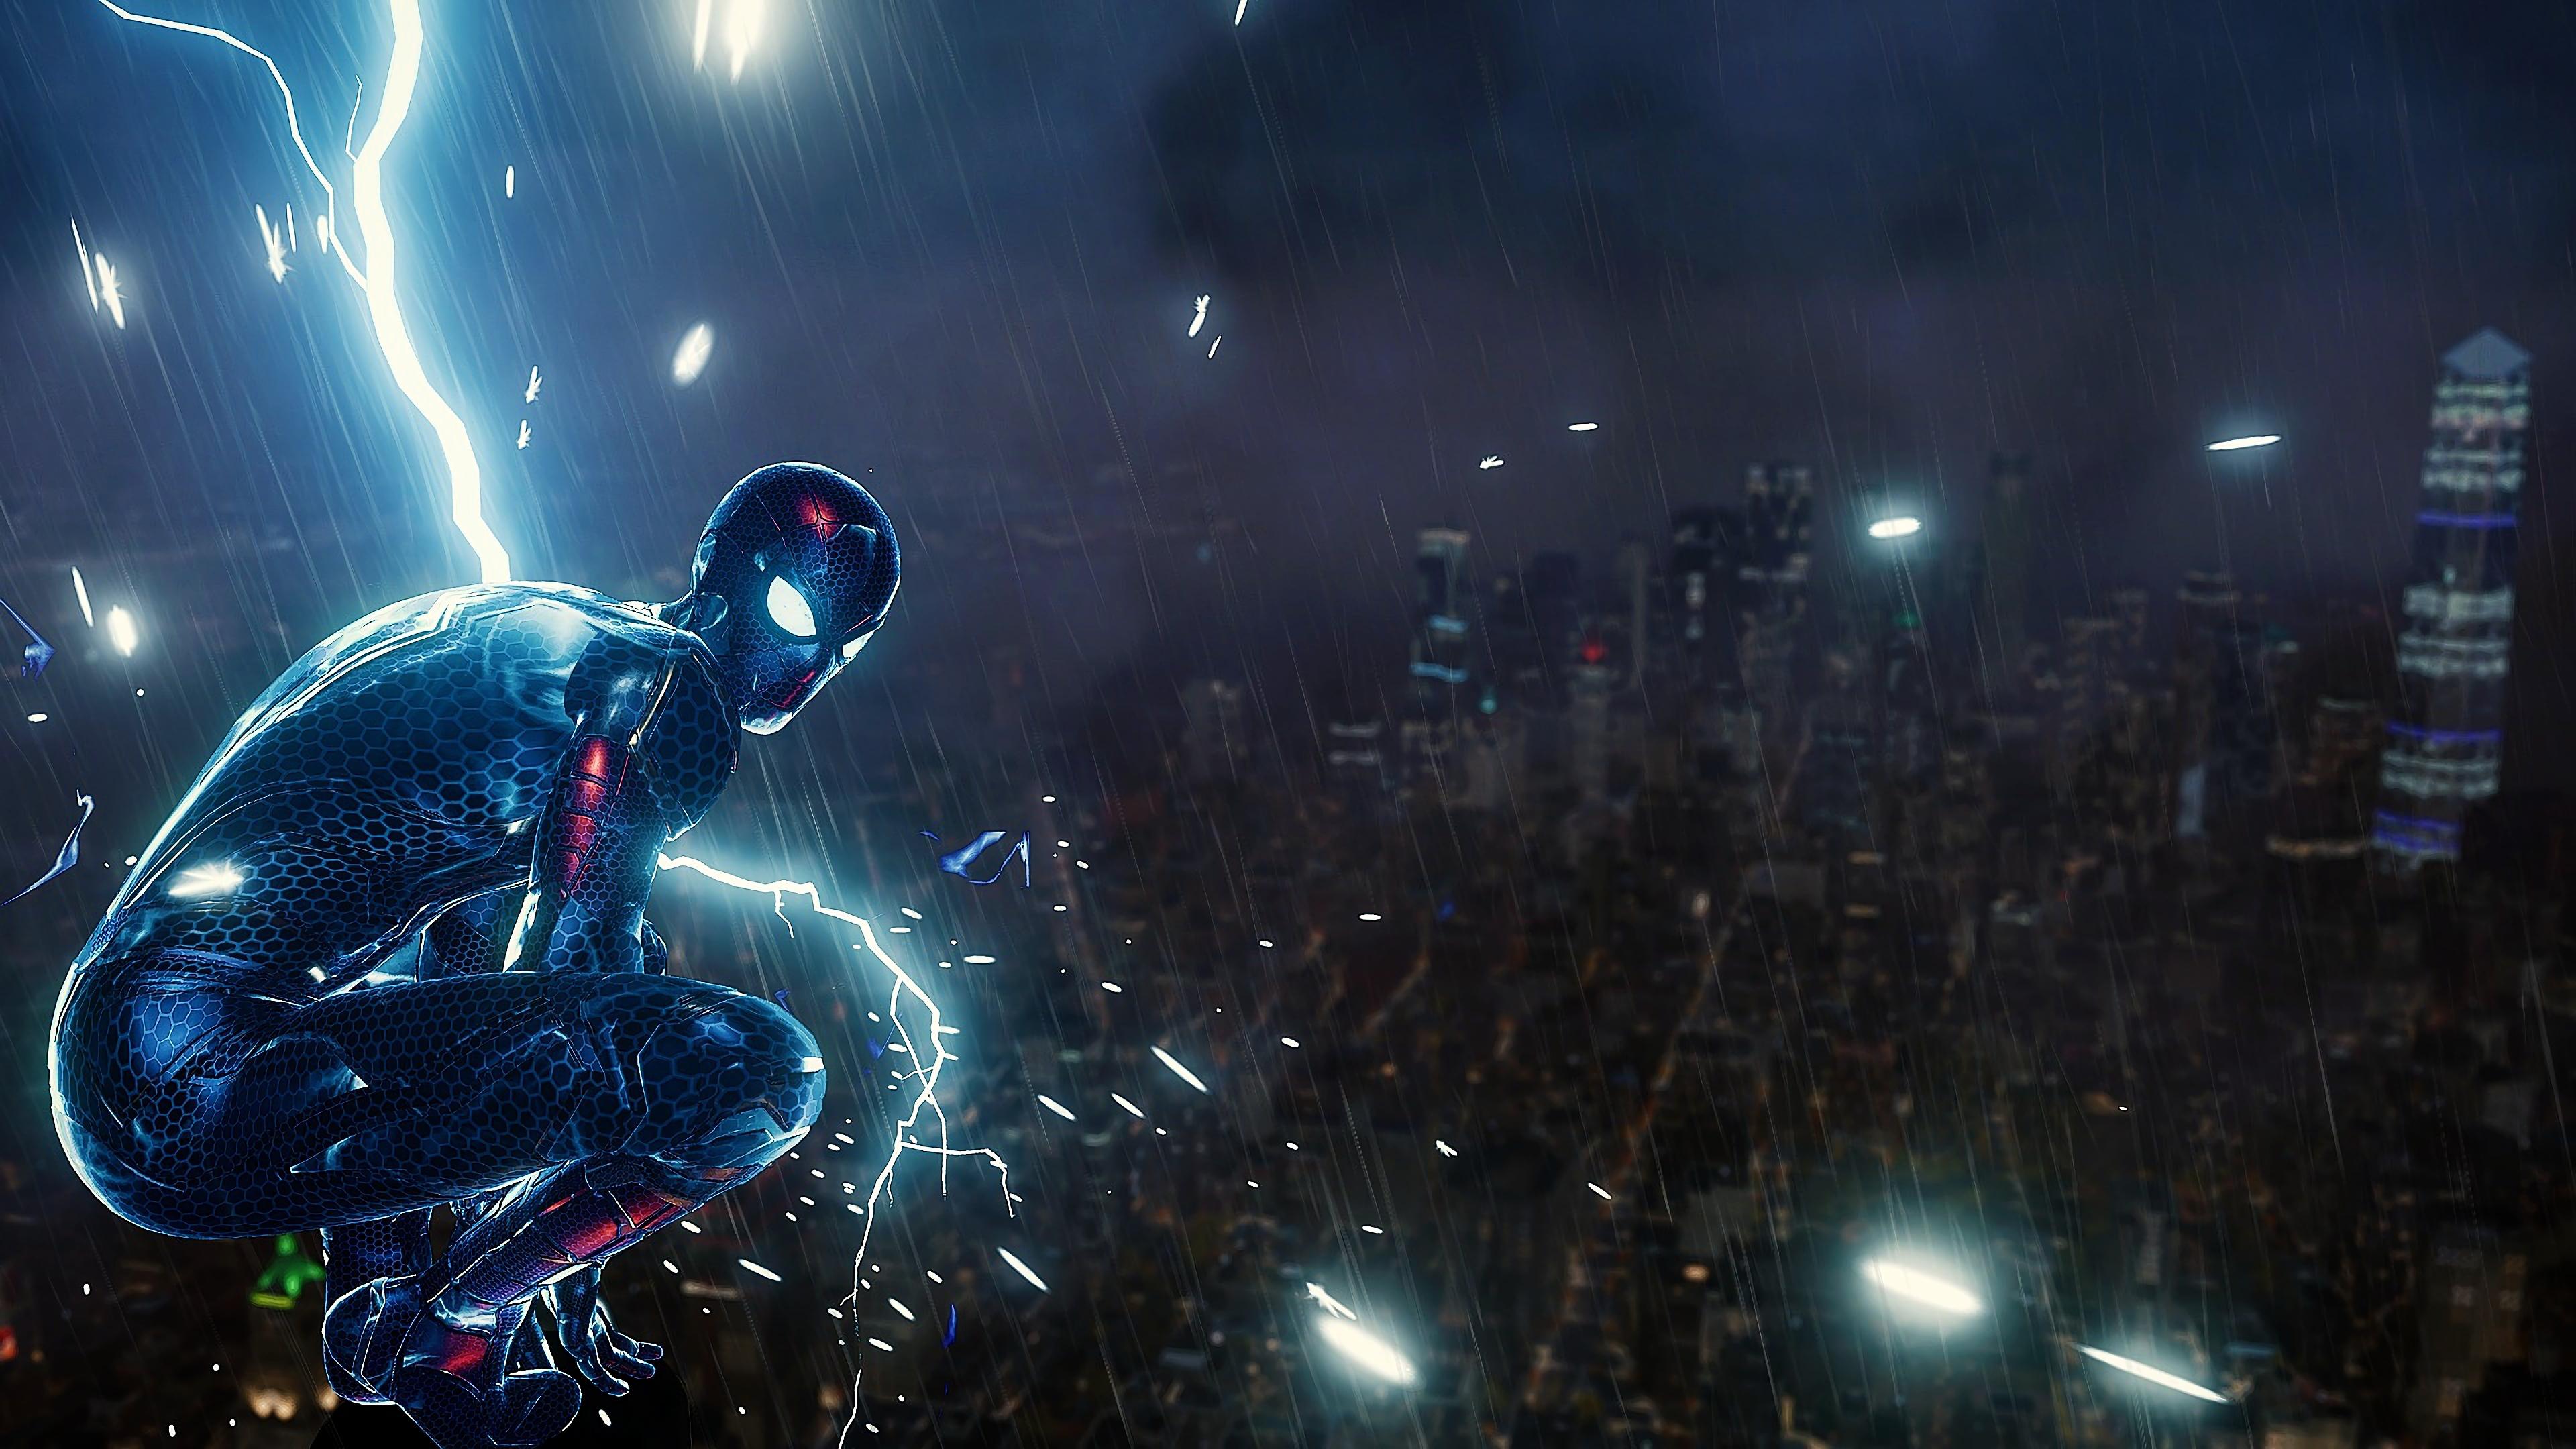 3840x2160 Spiderman Ps4 Lighting 4k HD 4k Wallpapers ...